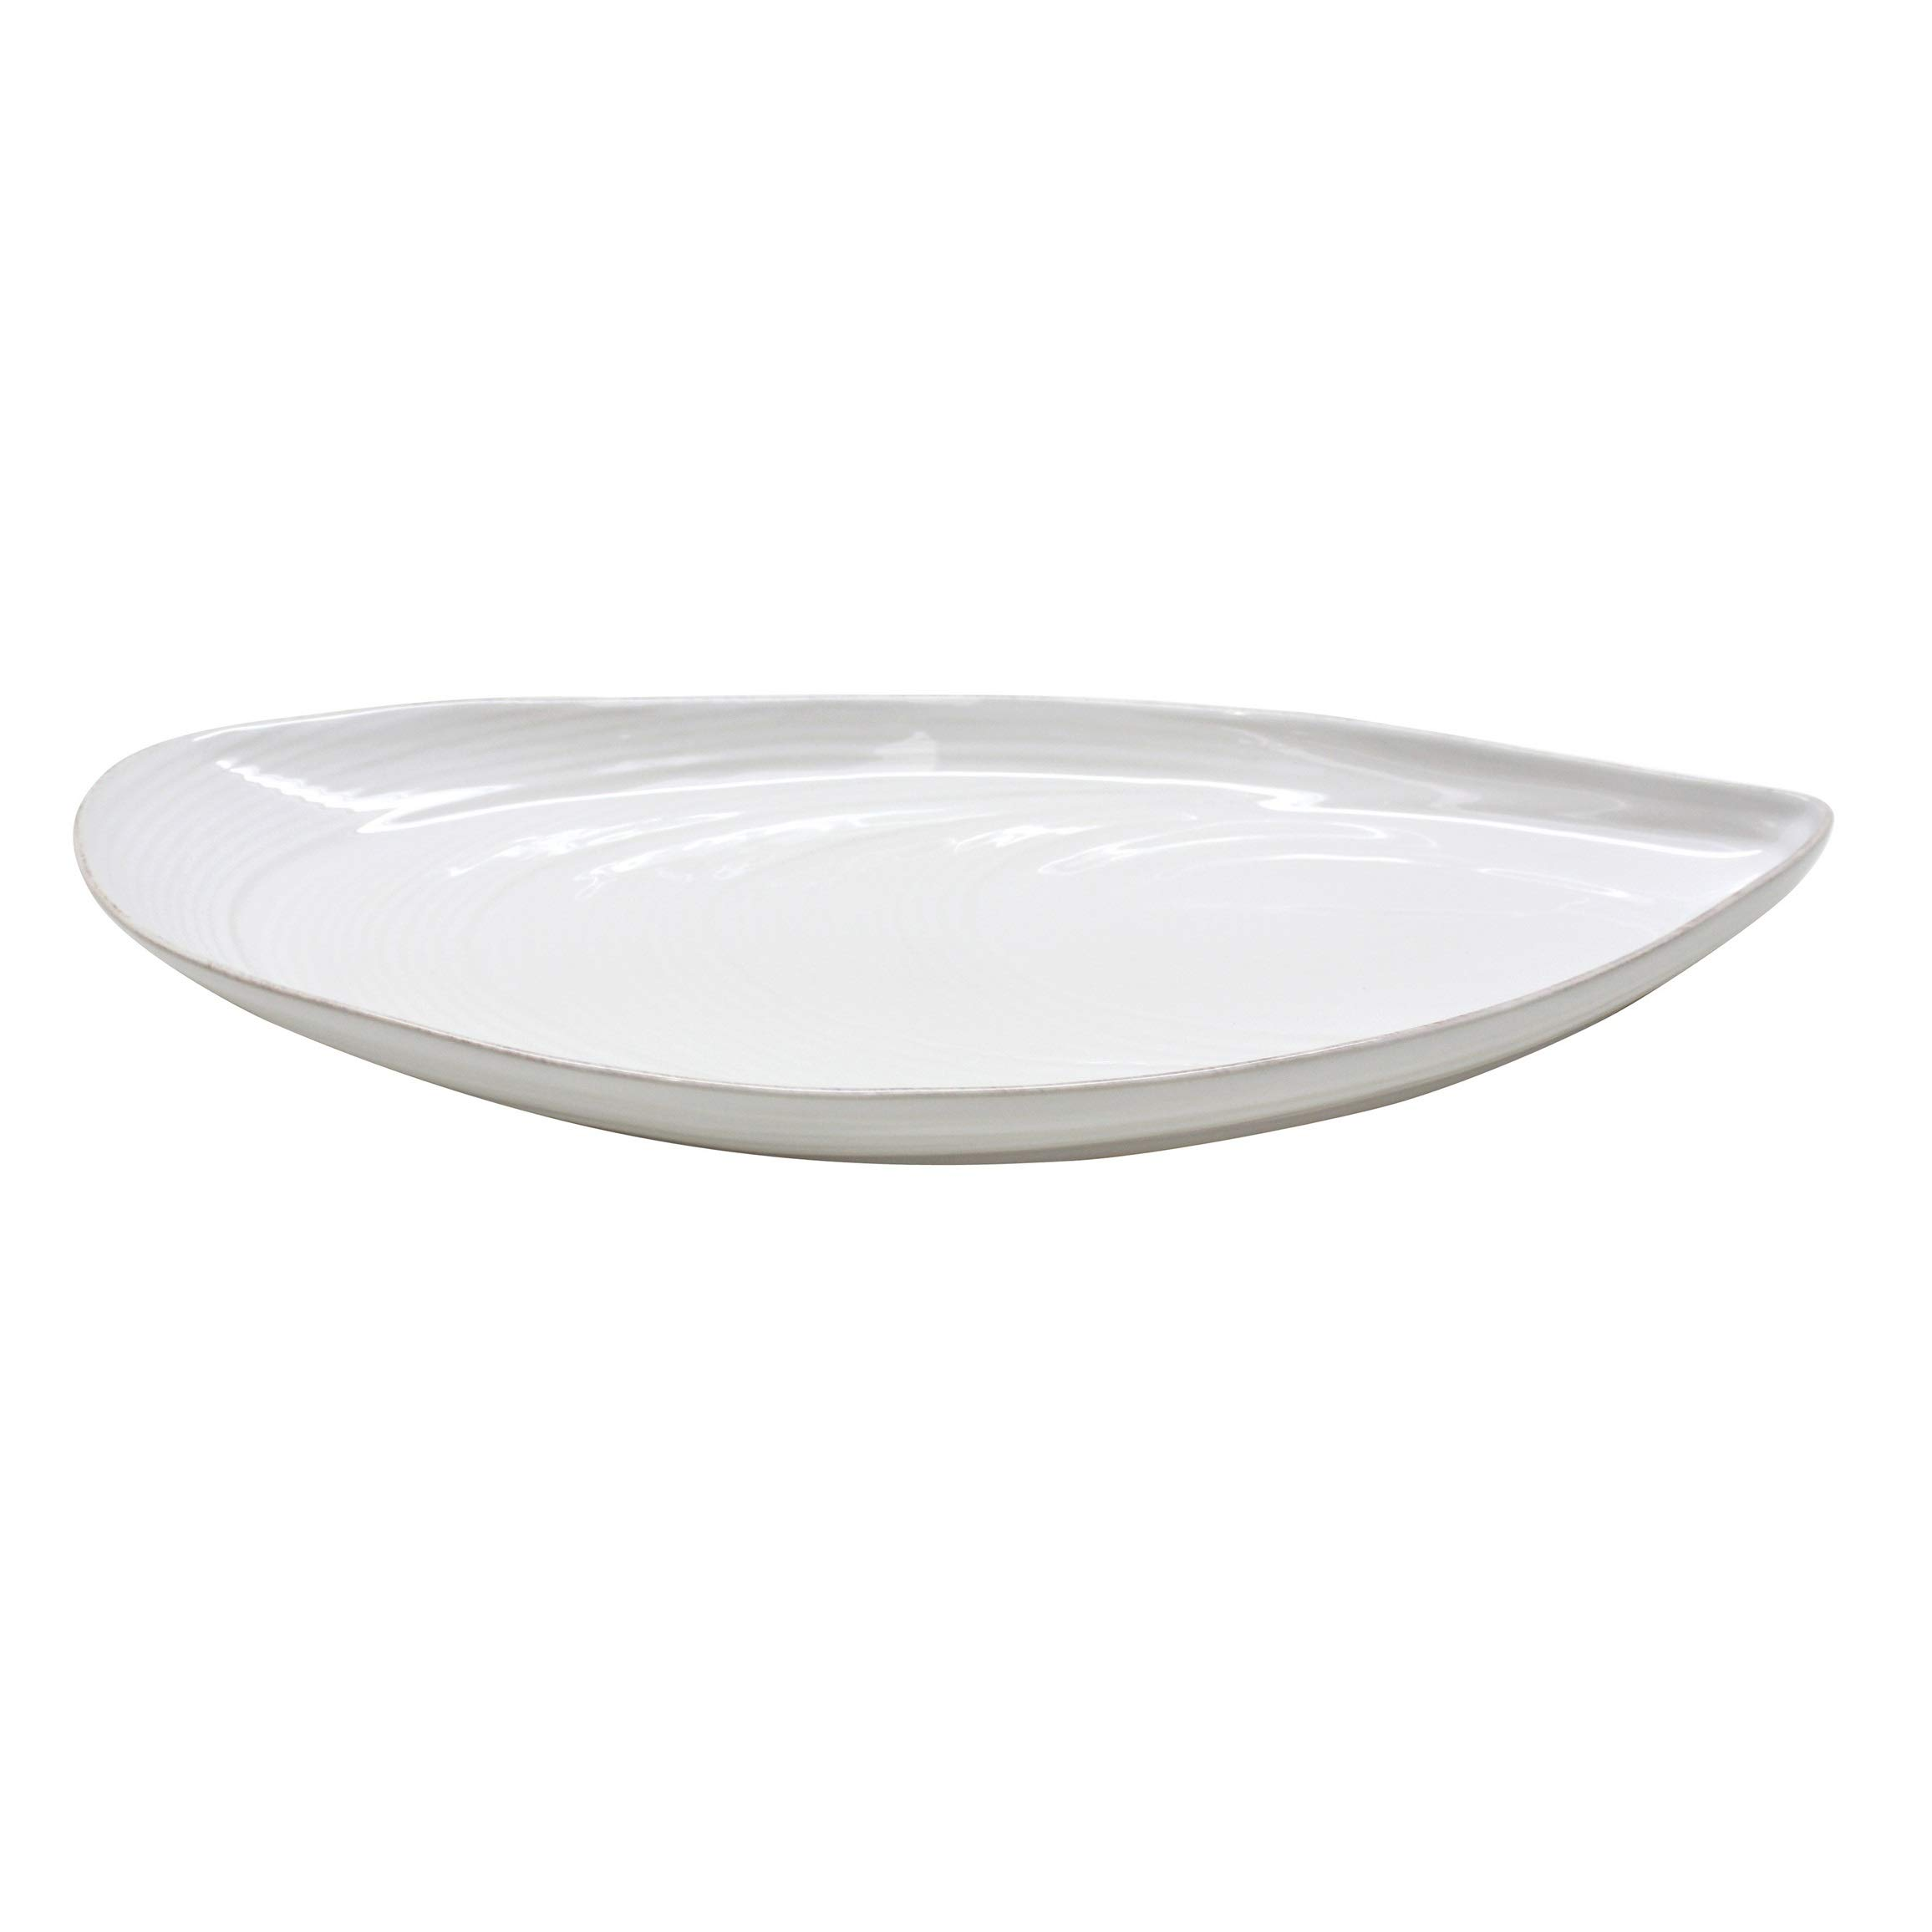 "COSTA NOVA Aparte Collection Stoneware Ceramic Mussel Platter Large 18"", White"